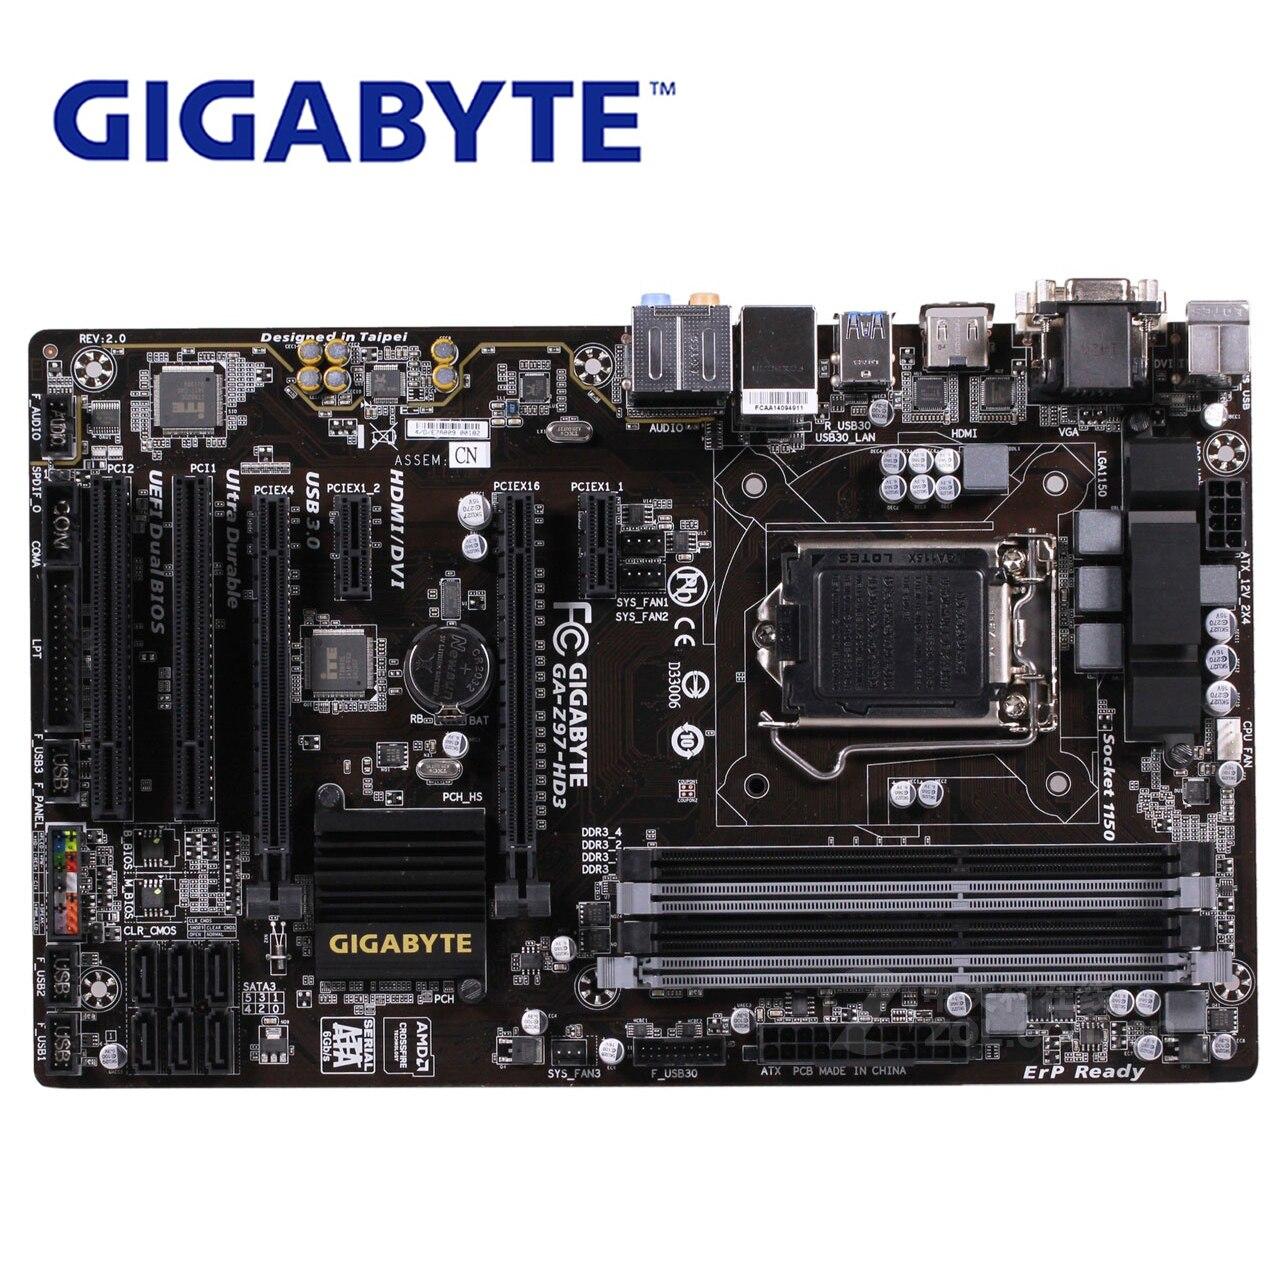 LGA1150 DDR3 Z97 Gigabyte GA-Z97-HD3 100% Original Motherboard USB3.0 32G Z97-HD3 Desktop Mainboard SATA III Mother board Used цена 2017